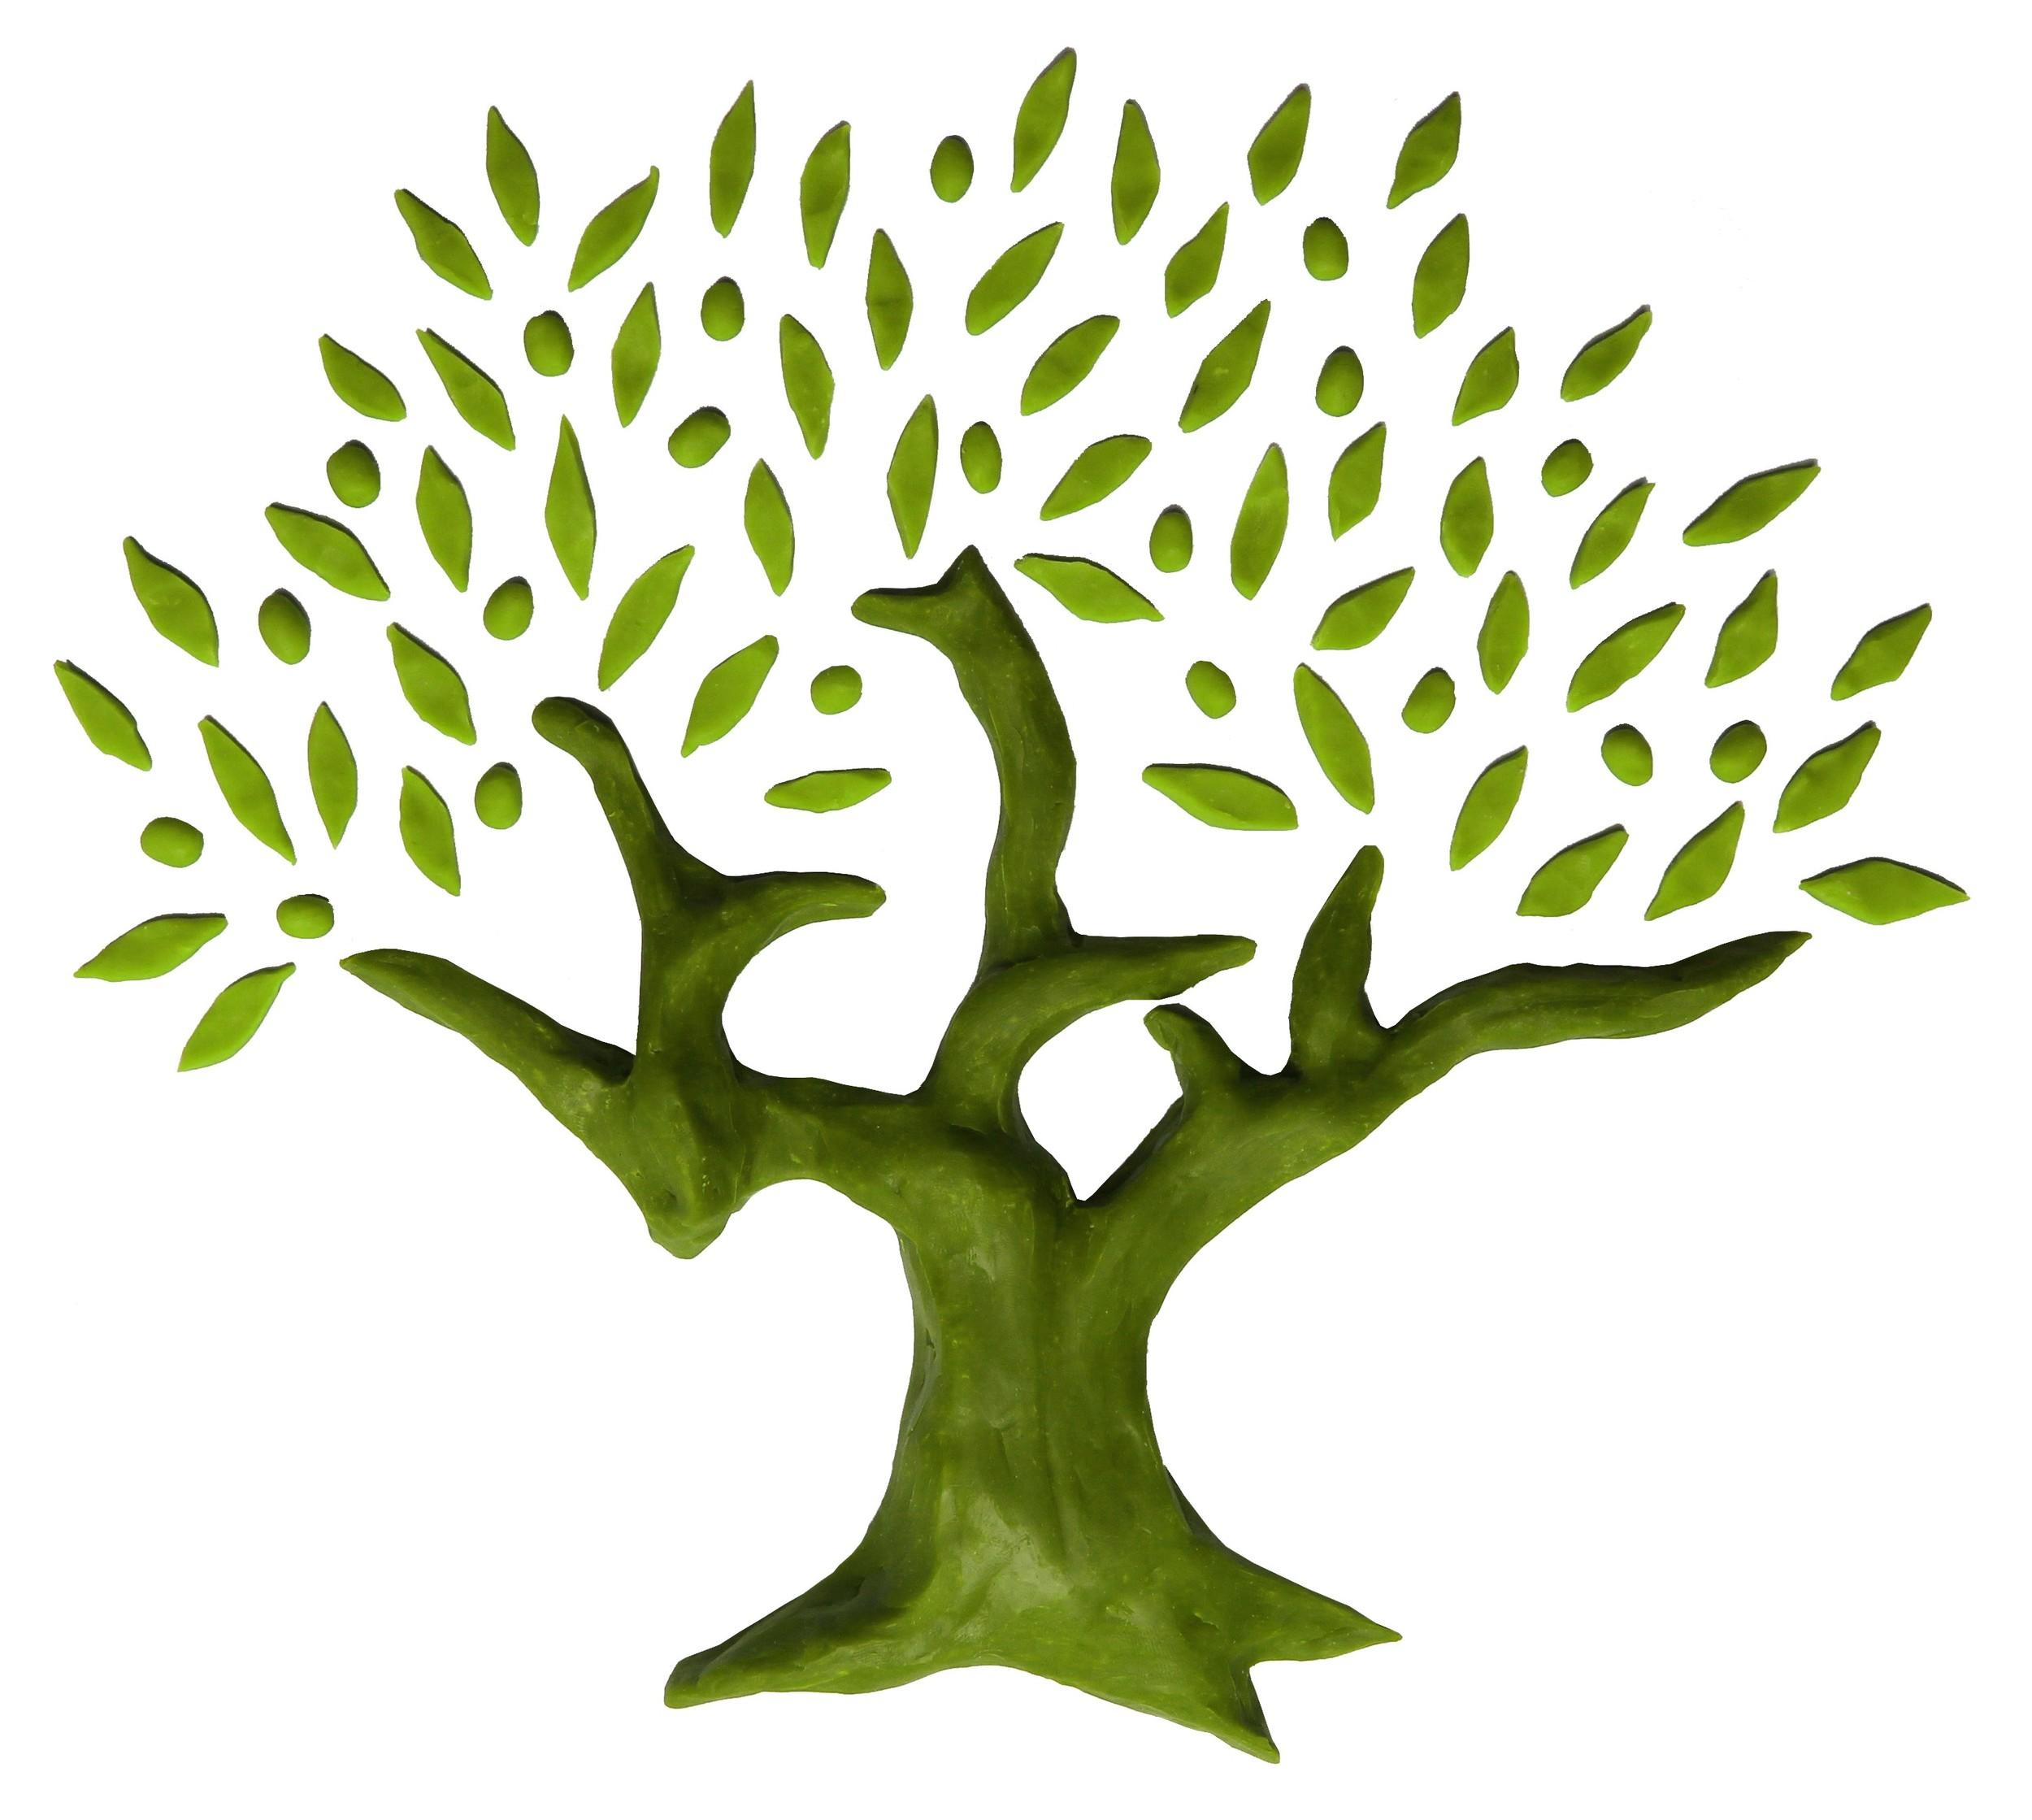 Wonderbaar Vernielde boom groeit uit tot symbool — Plant een Olijfboom UM-56